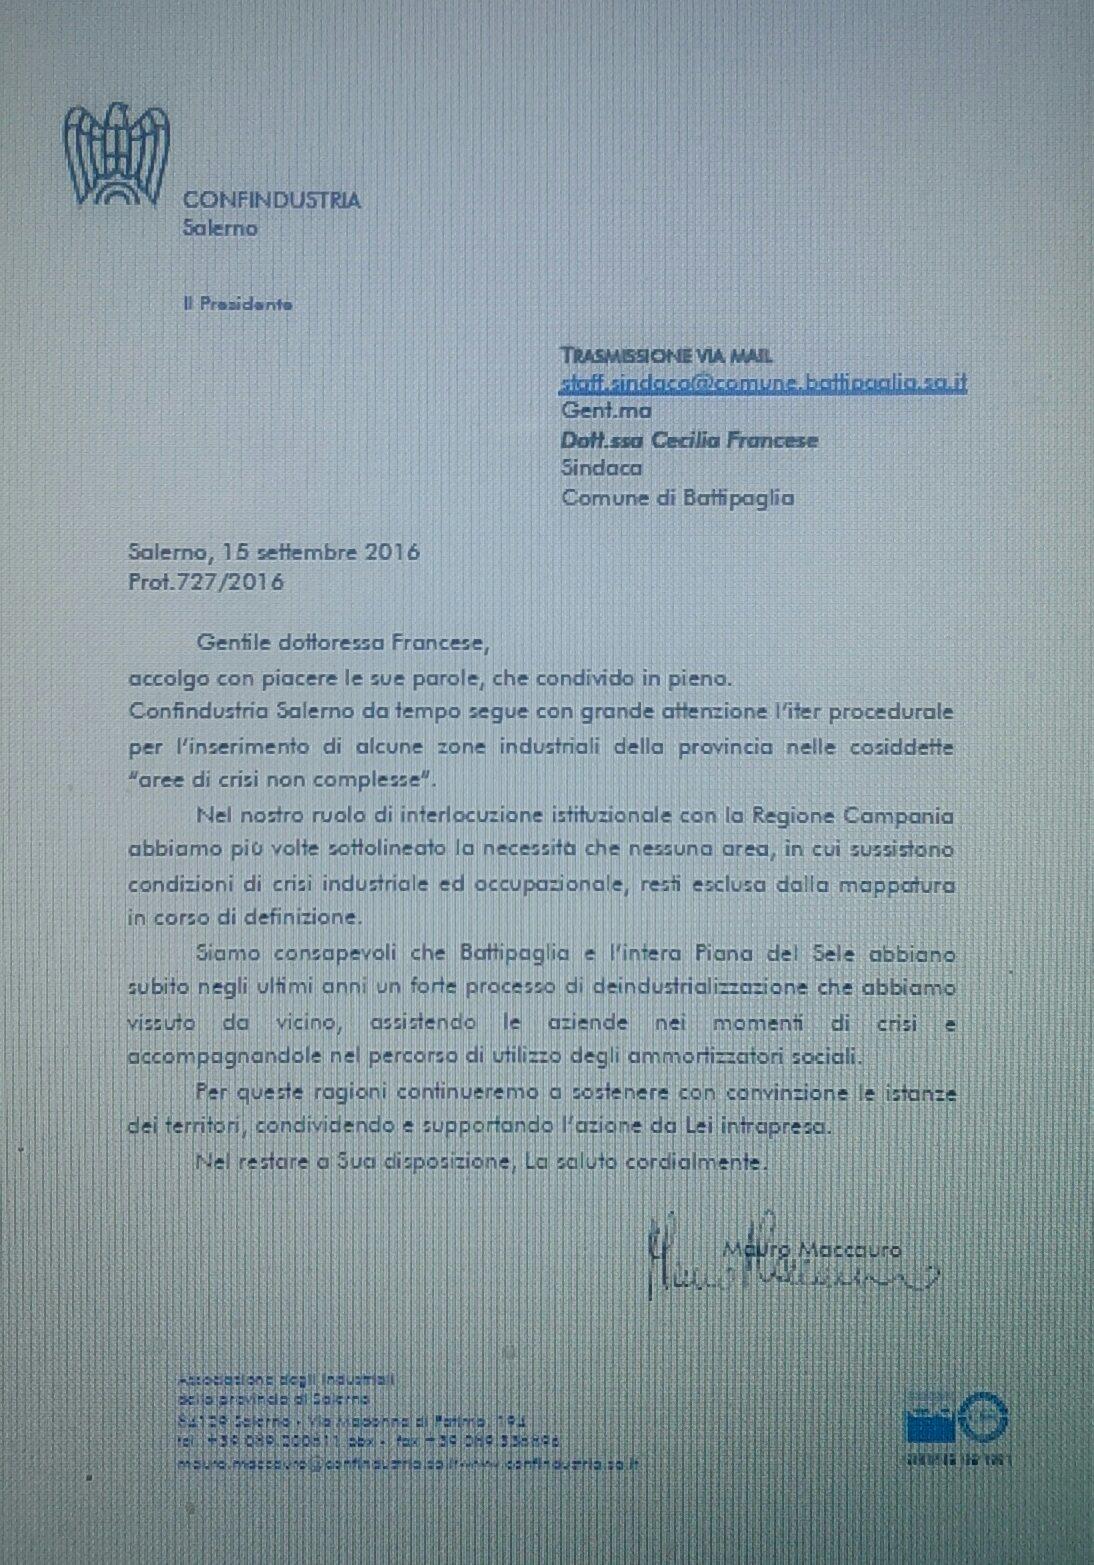 maccauro-risposta-al-sindaco-francese